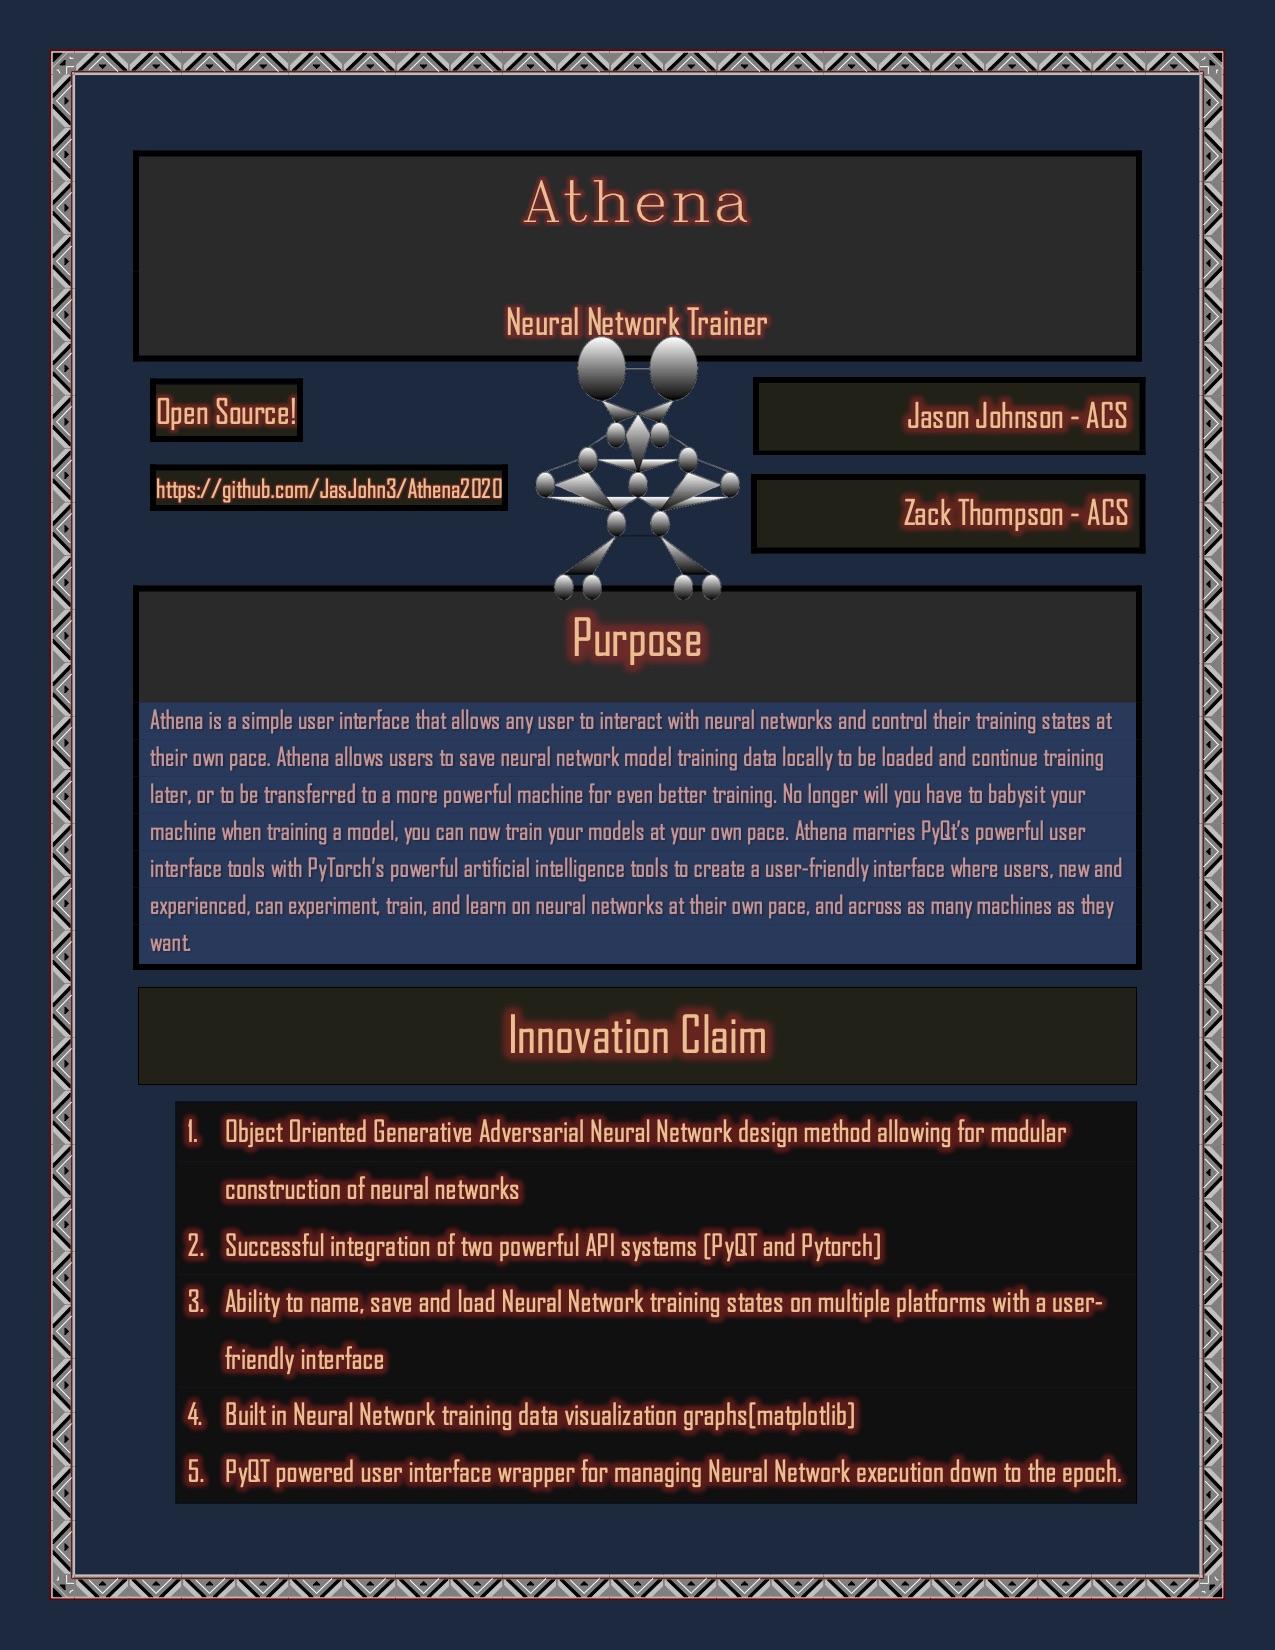 THOM_AthenaPosterCopy-1